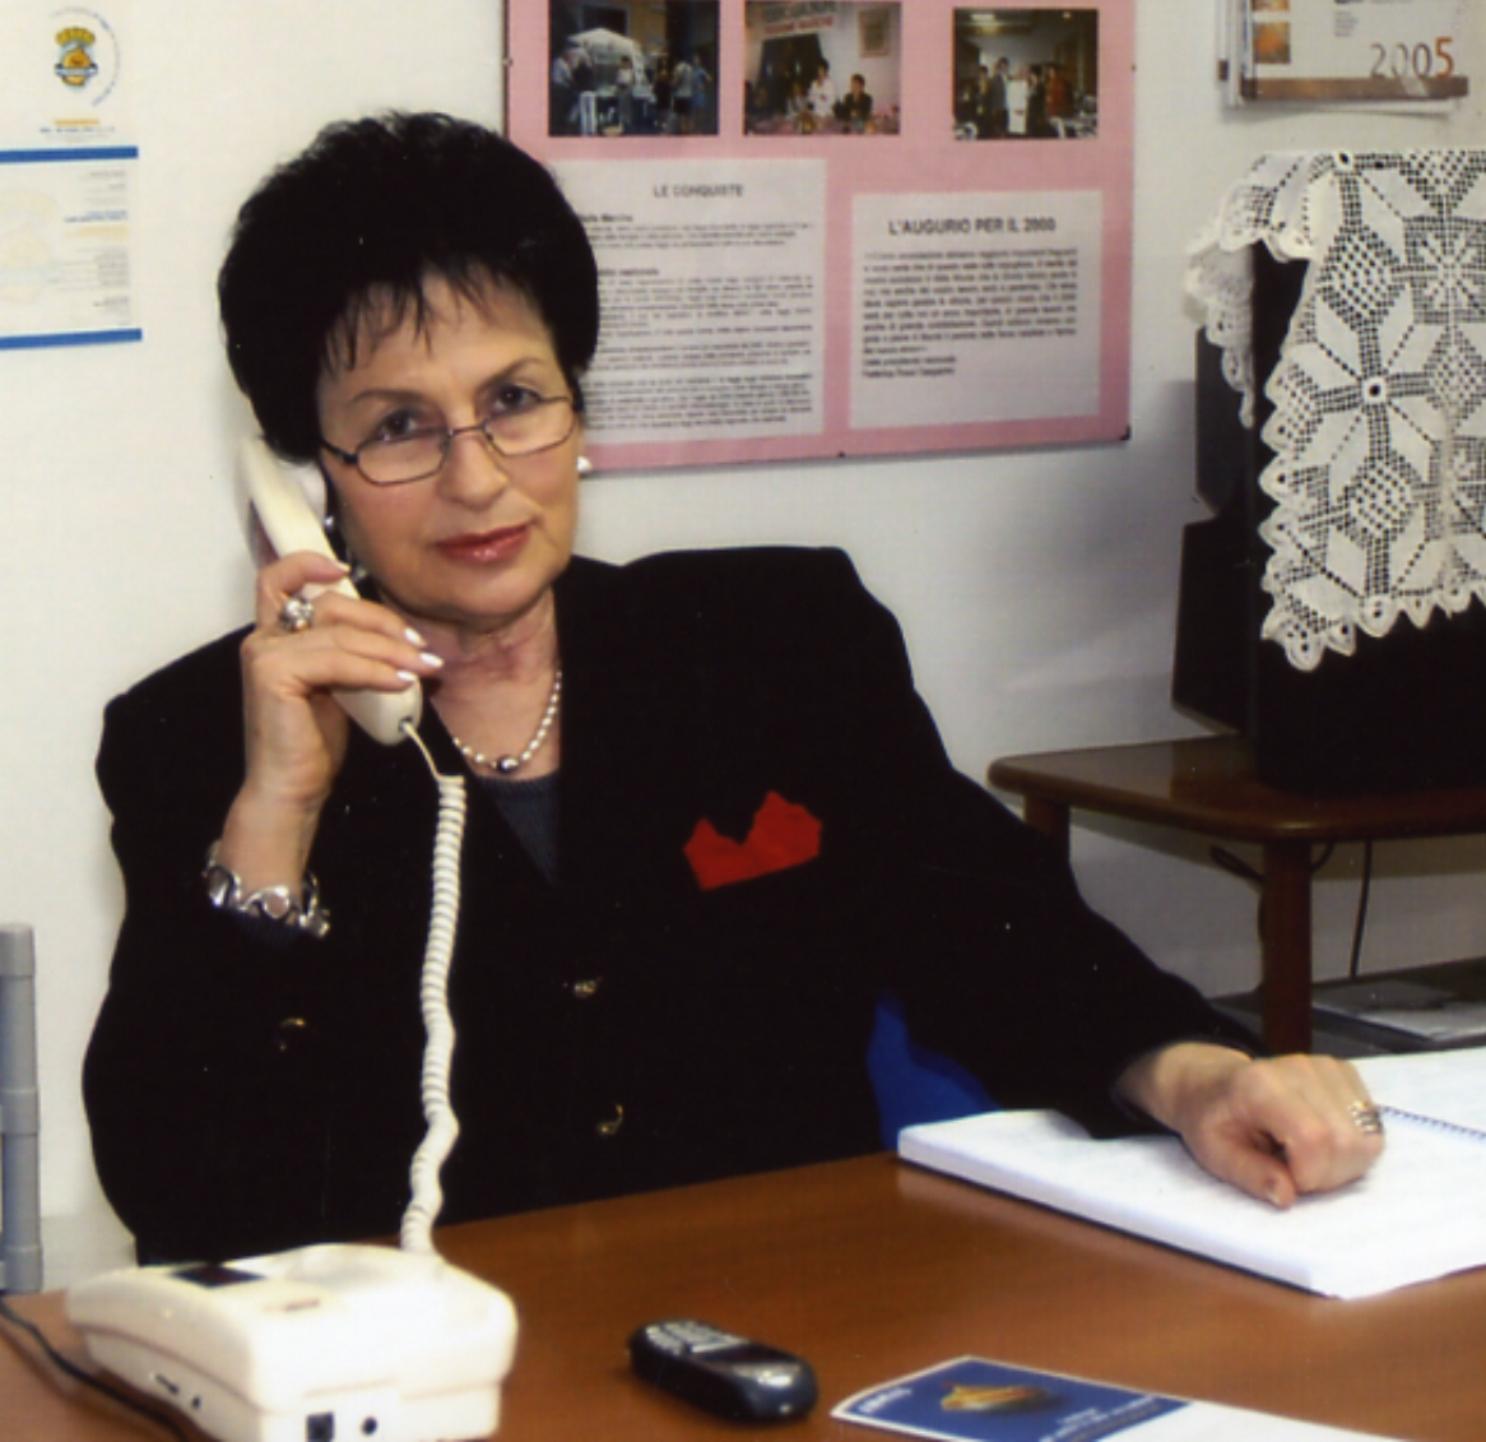 Presidente-regionale-Maria-Elvira-Conti-Fabbri